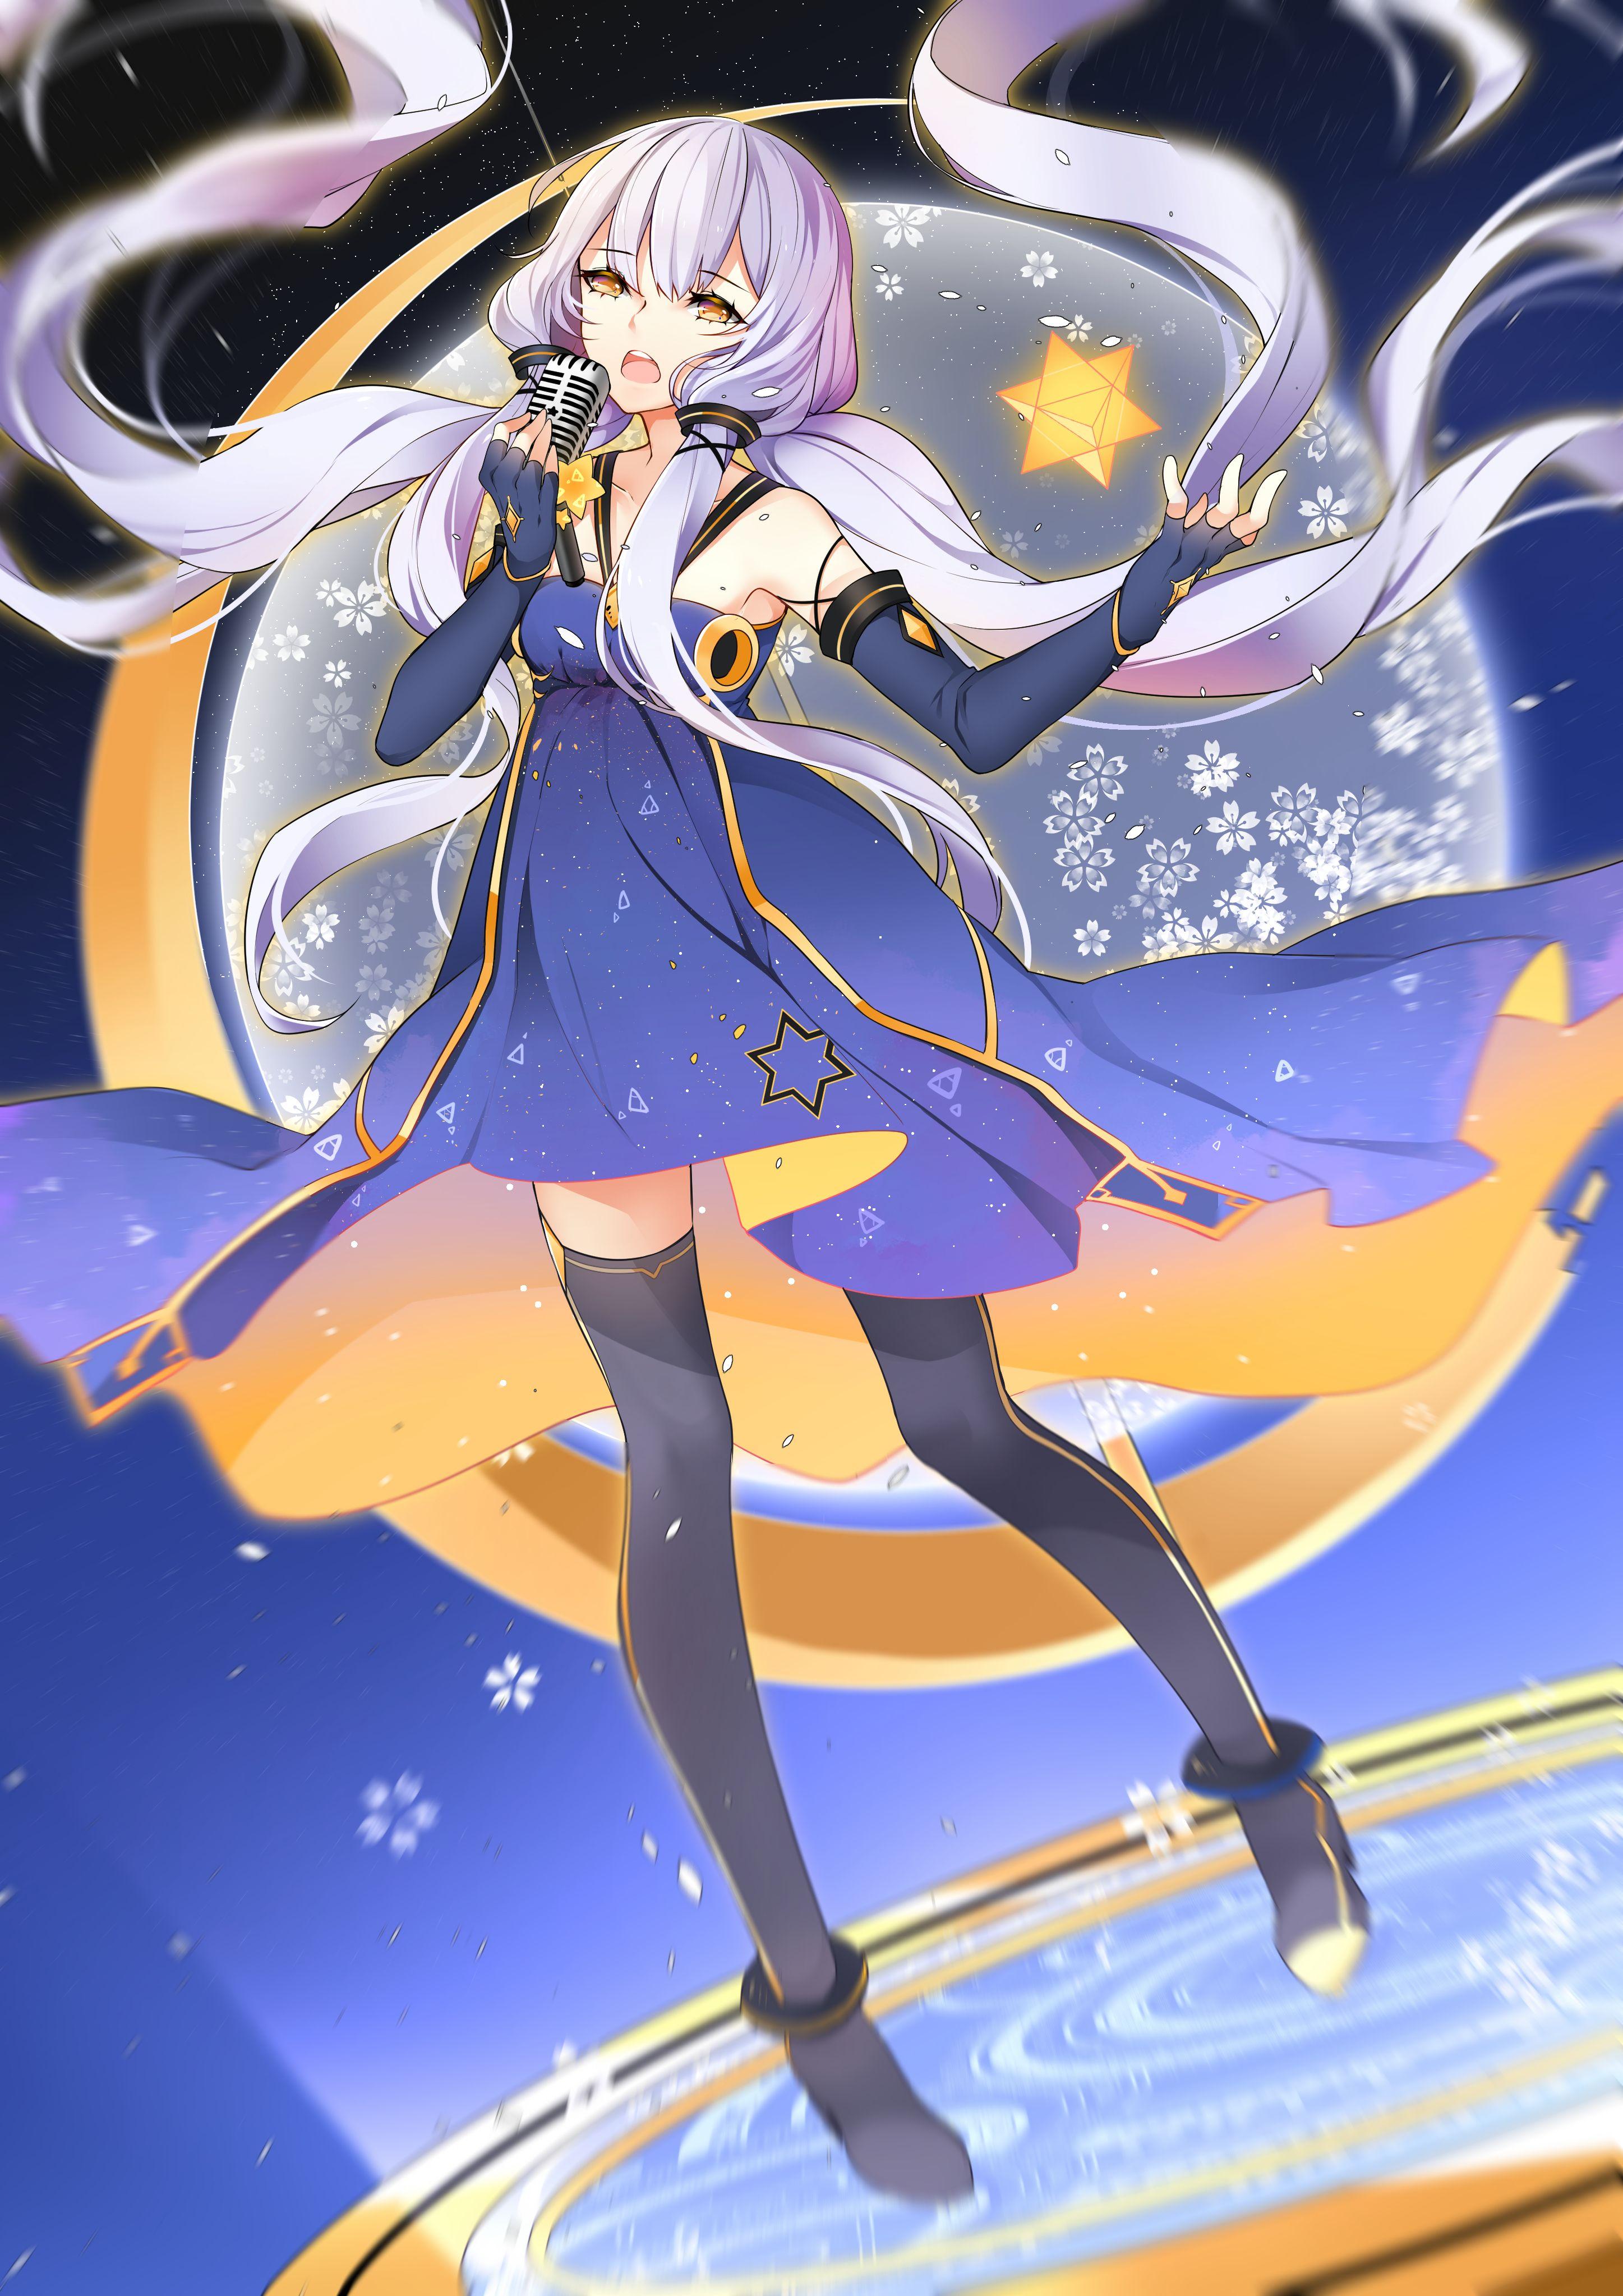 Asahina mikuru blush chinese clothes chinese dress game cg - Stardust Vocaloid 1932793 Zerochan Vsinger Vocaloid China Pinterest Vocaloid Anime And Manga